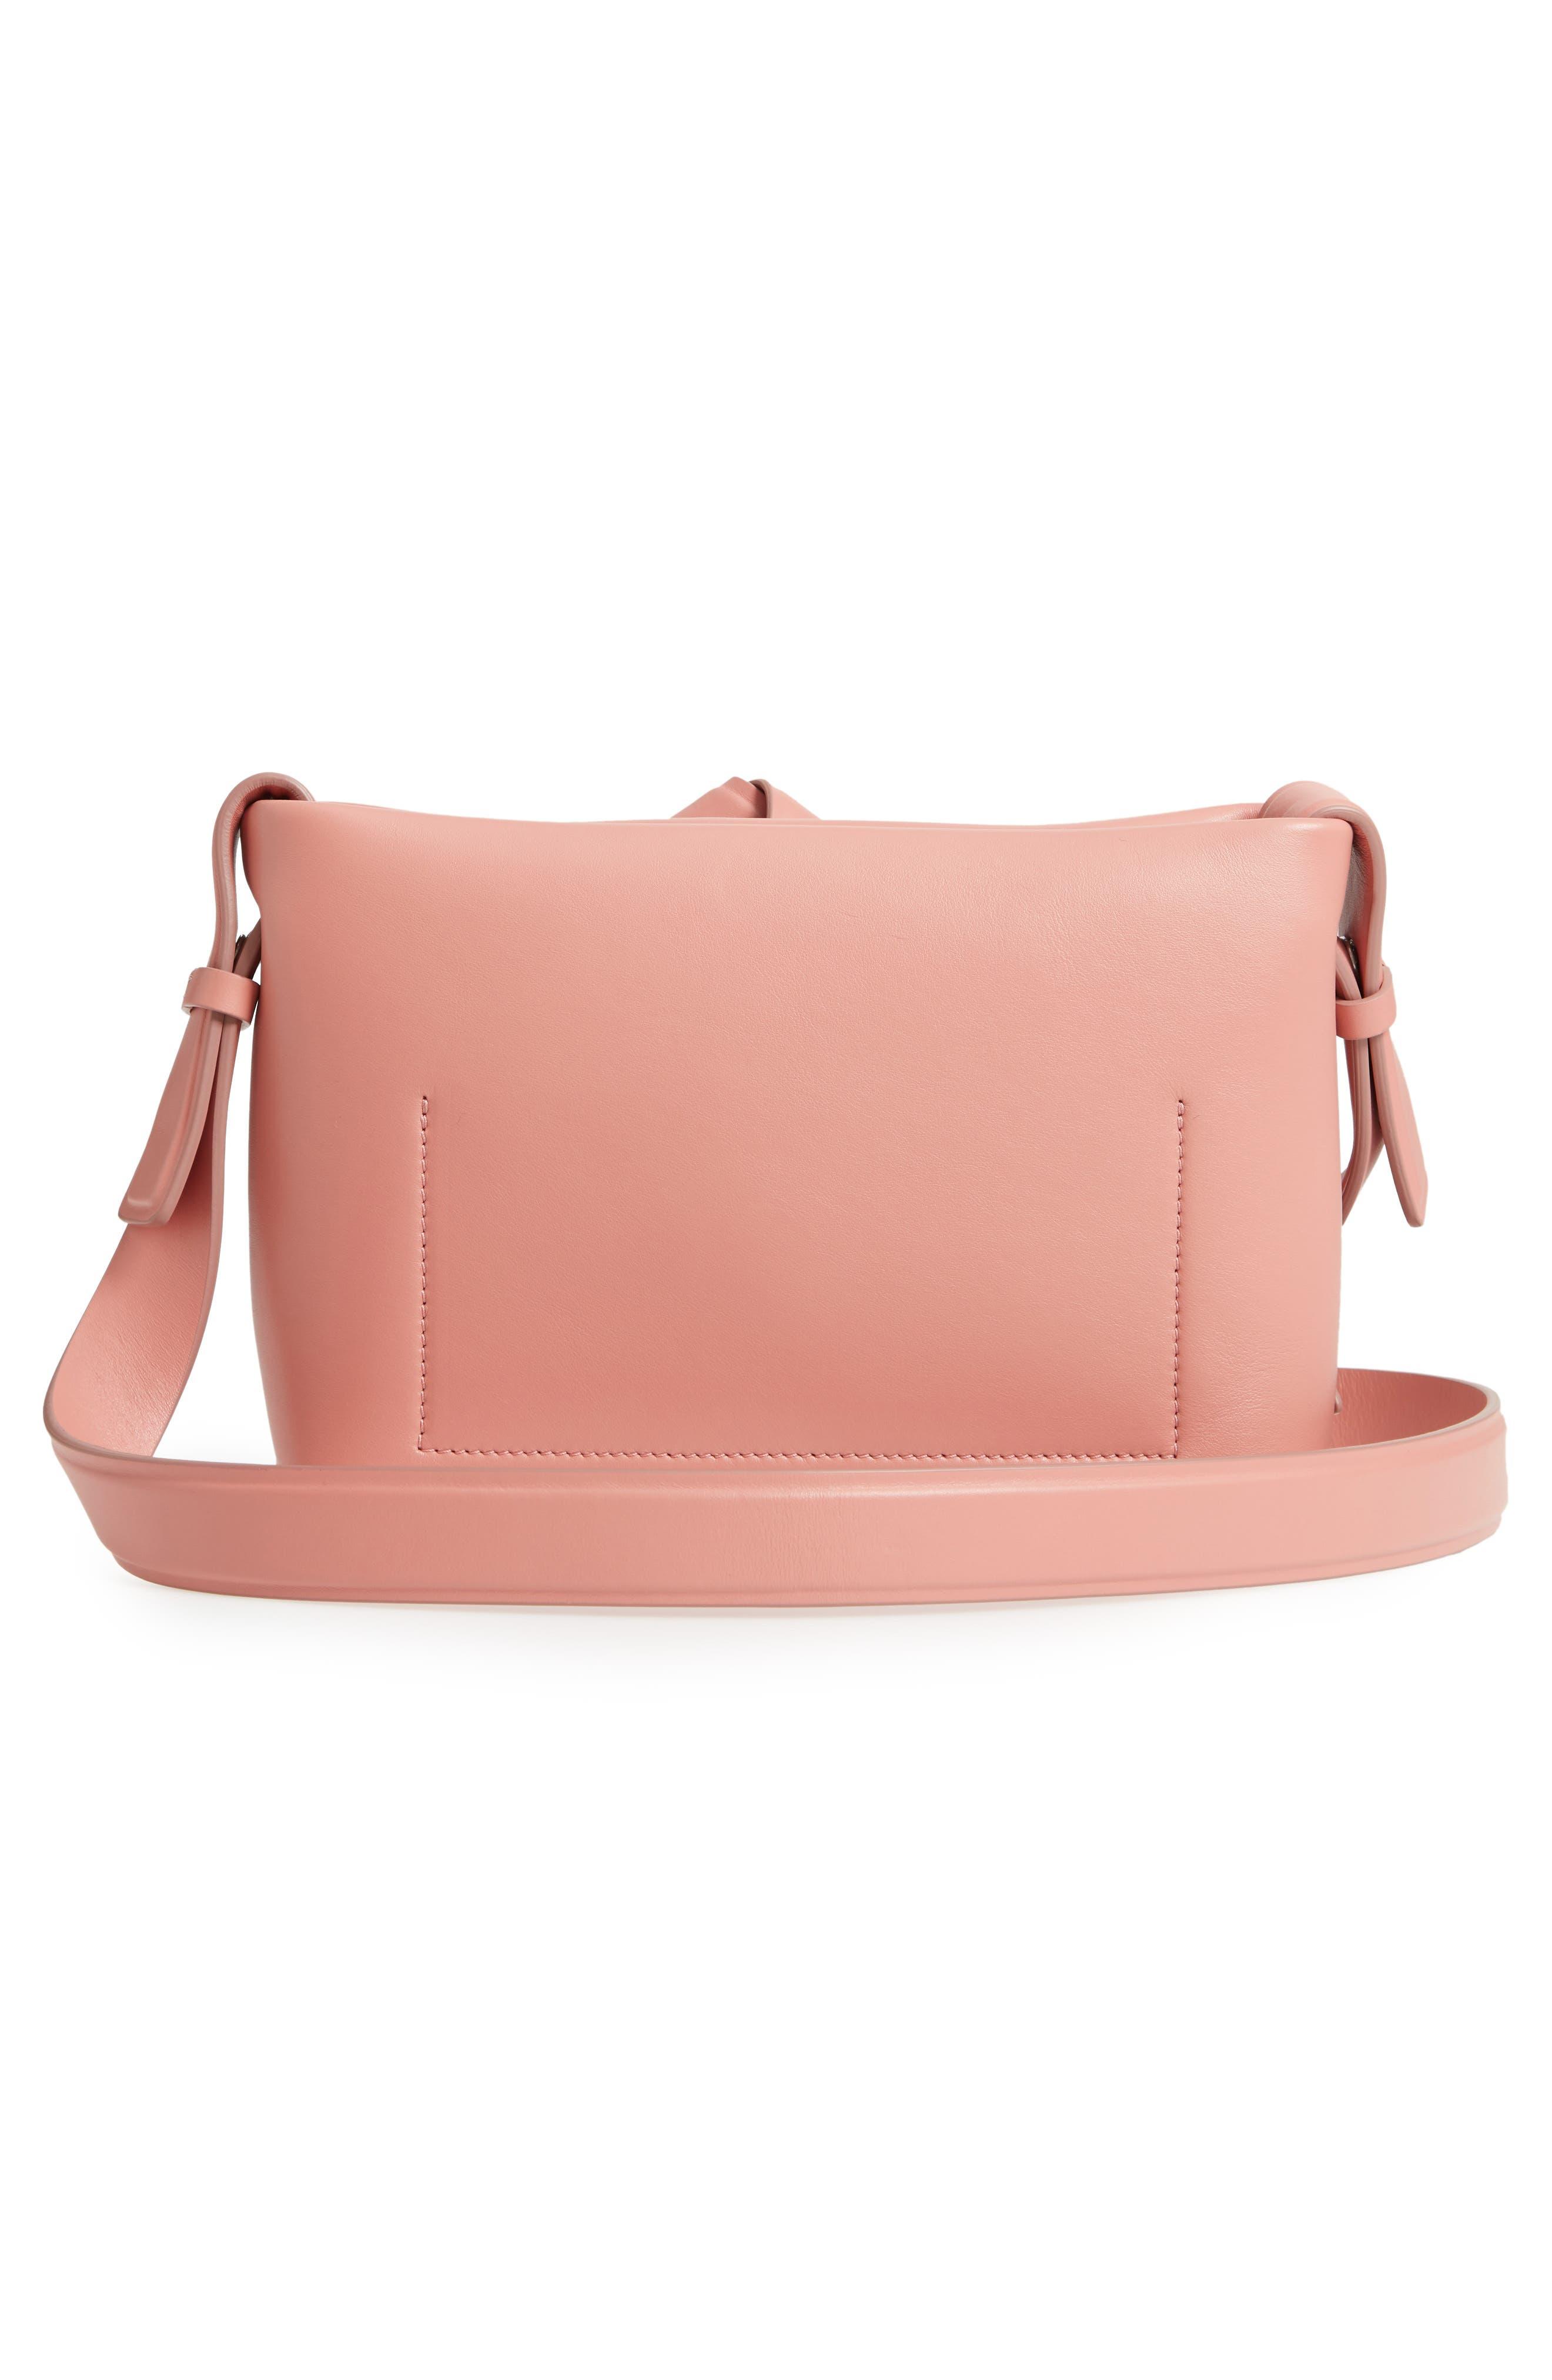 Musubi Knot Leather Handbag,                             Alternate thumbnail 3, color,                             PINK